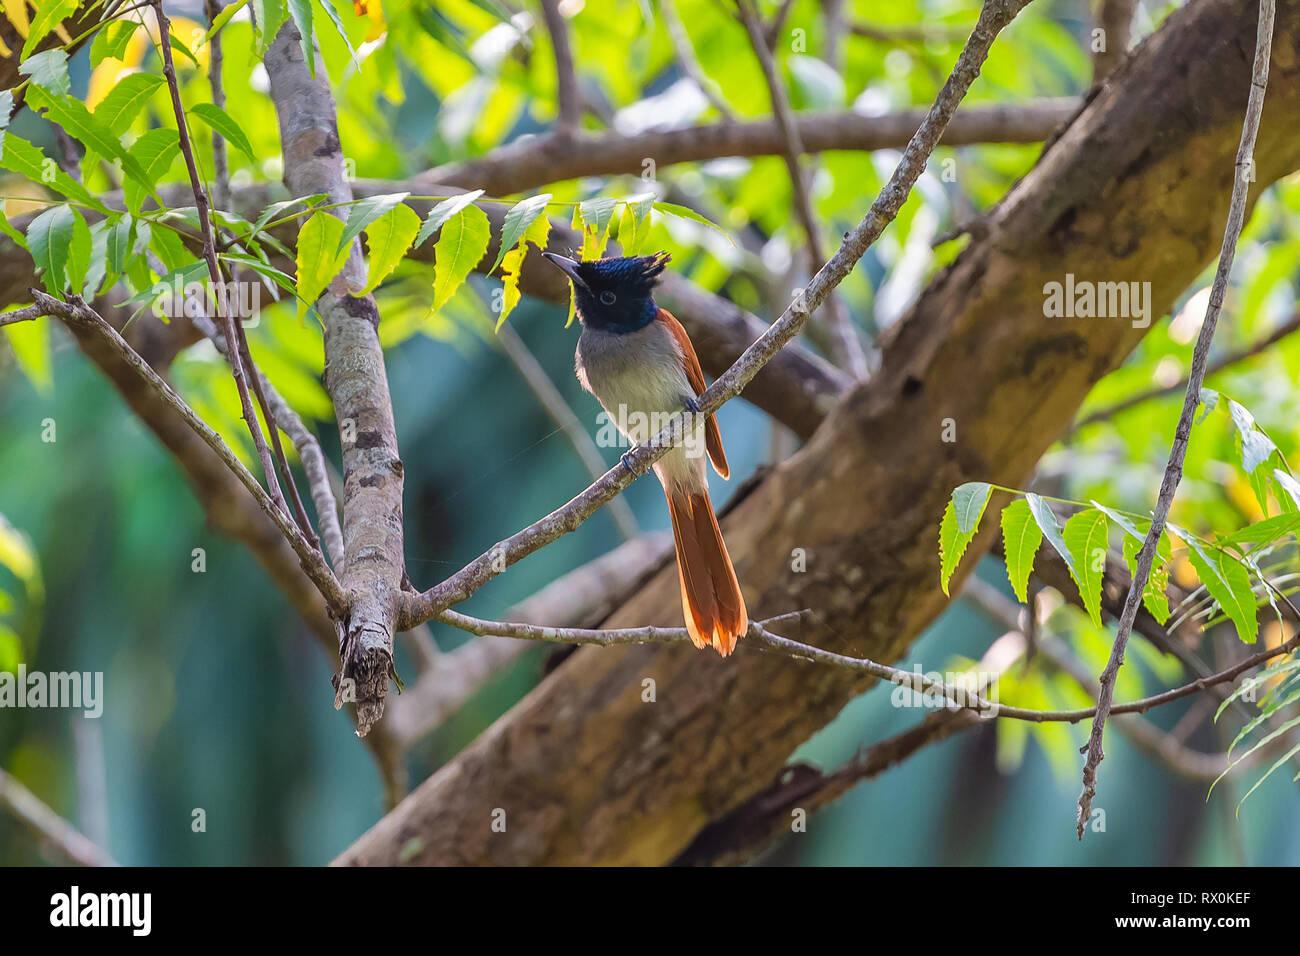 Asian paridise flycatcher. Sri Lanka. Stock Photo